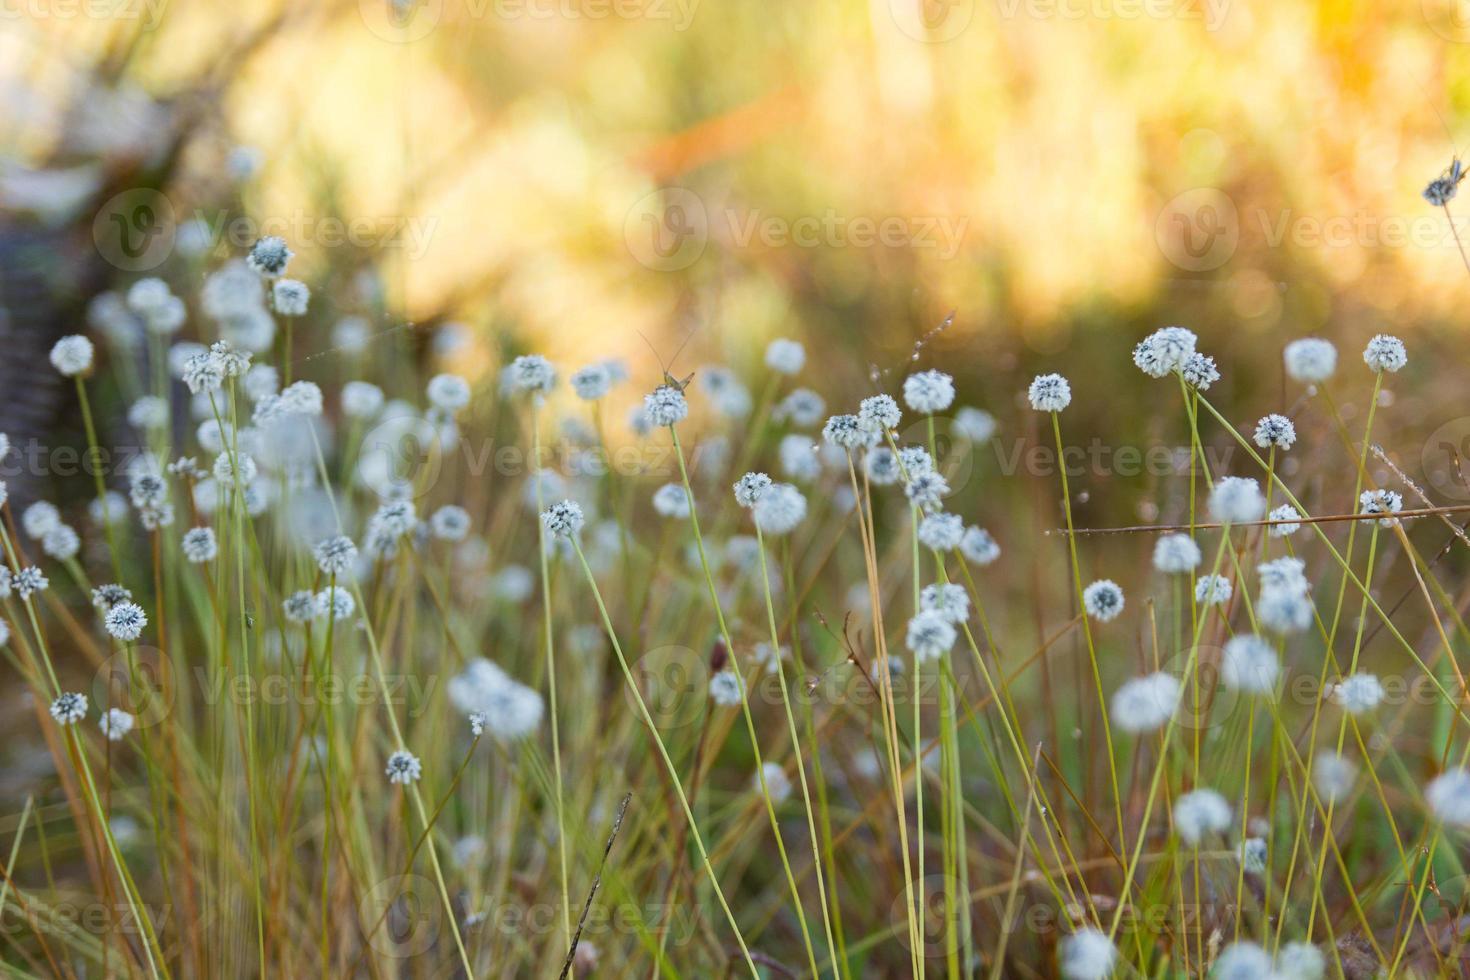 kradumngen (eriocaulon henryanum) Blume foto